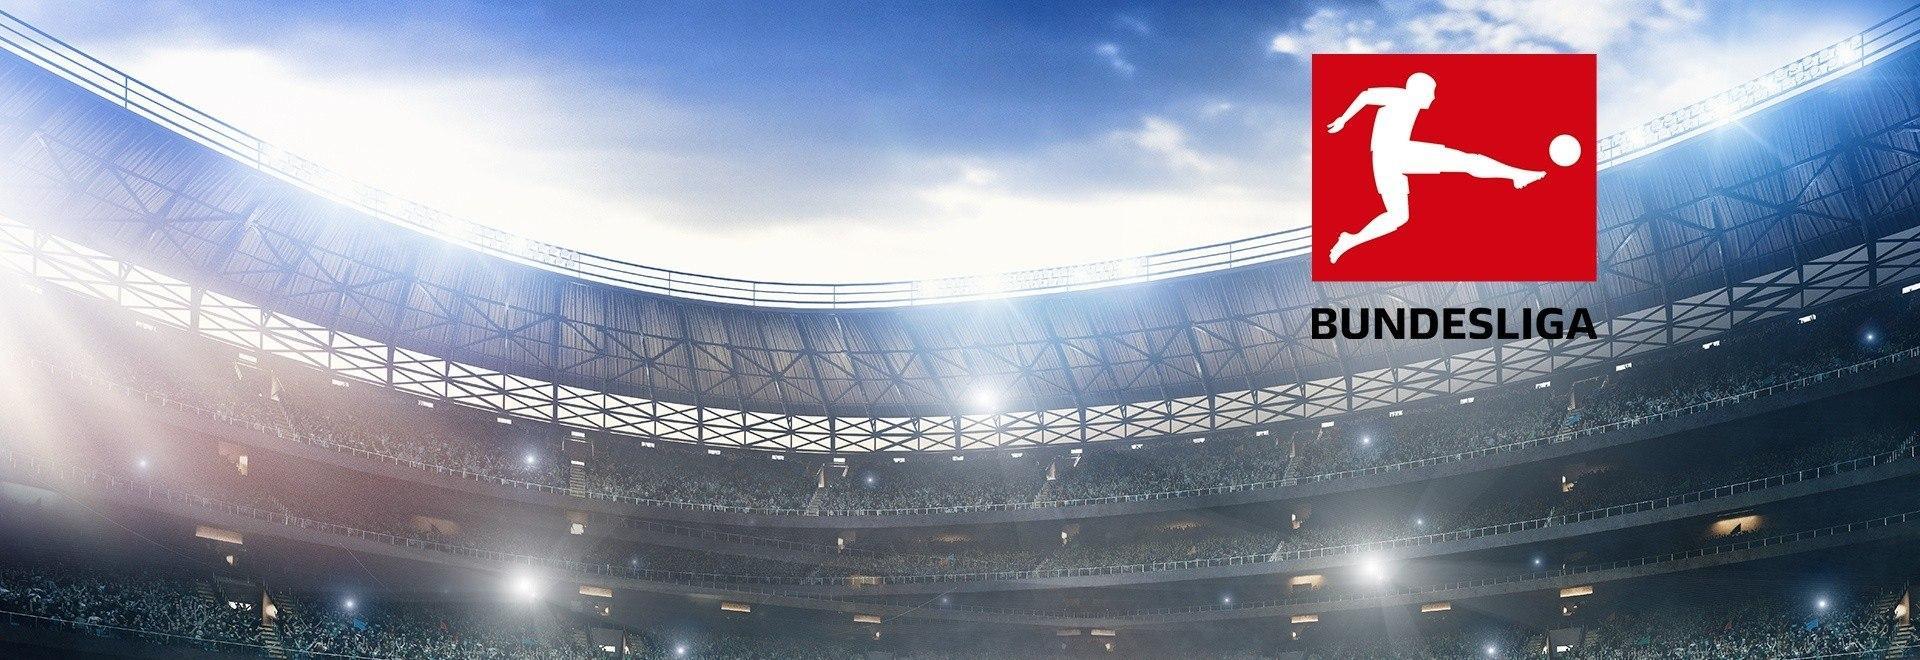 Bundesliga - Stag. 2020 - Playout Ritorno